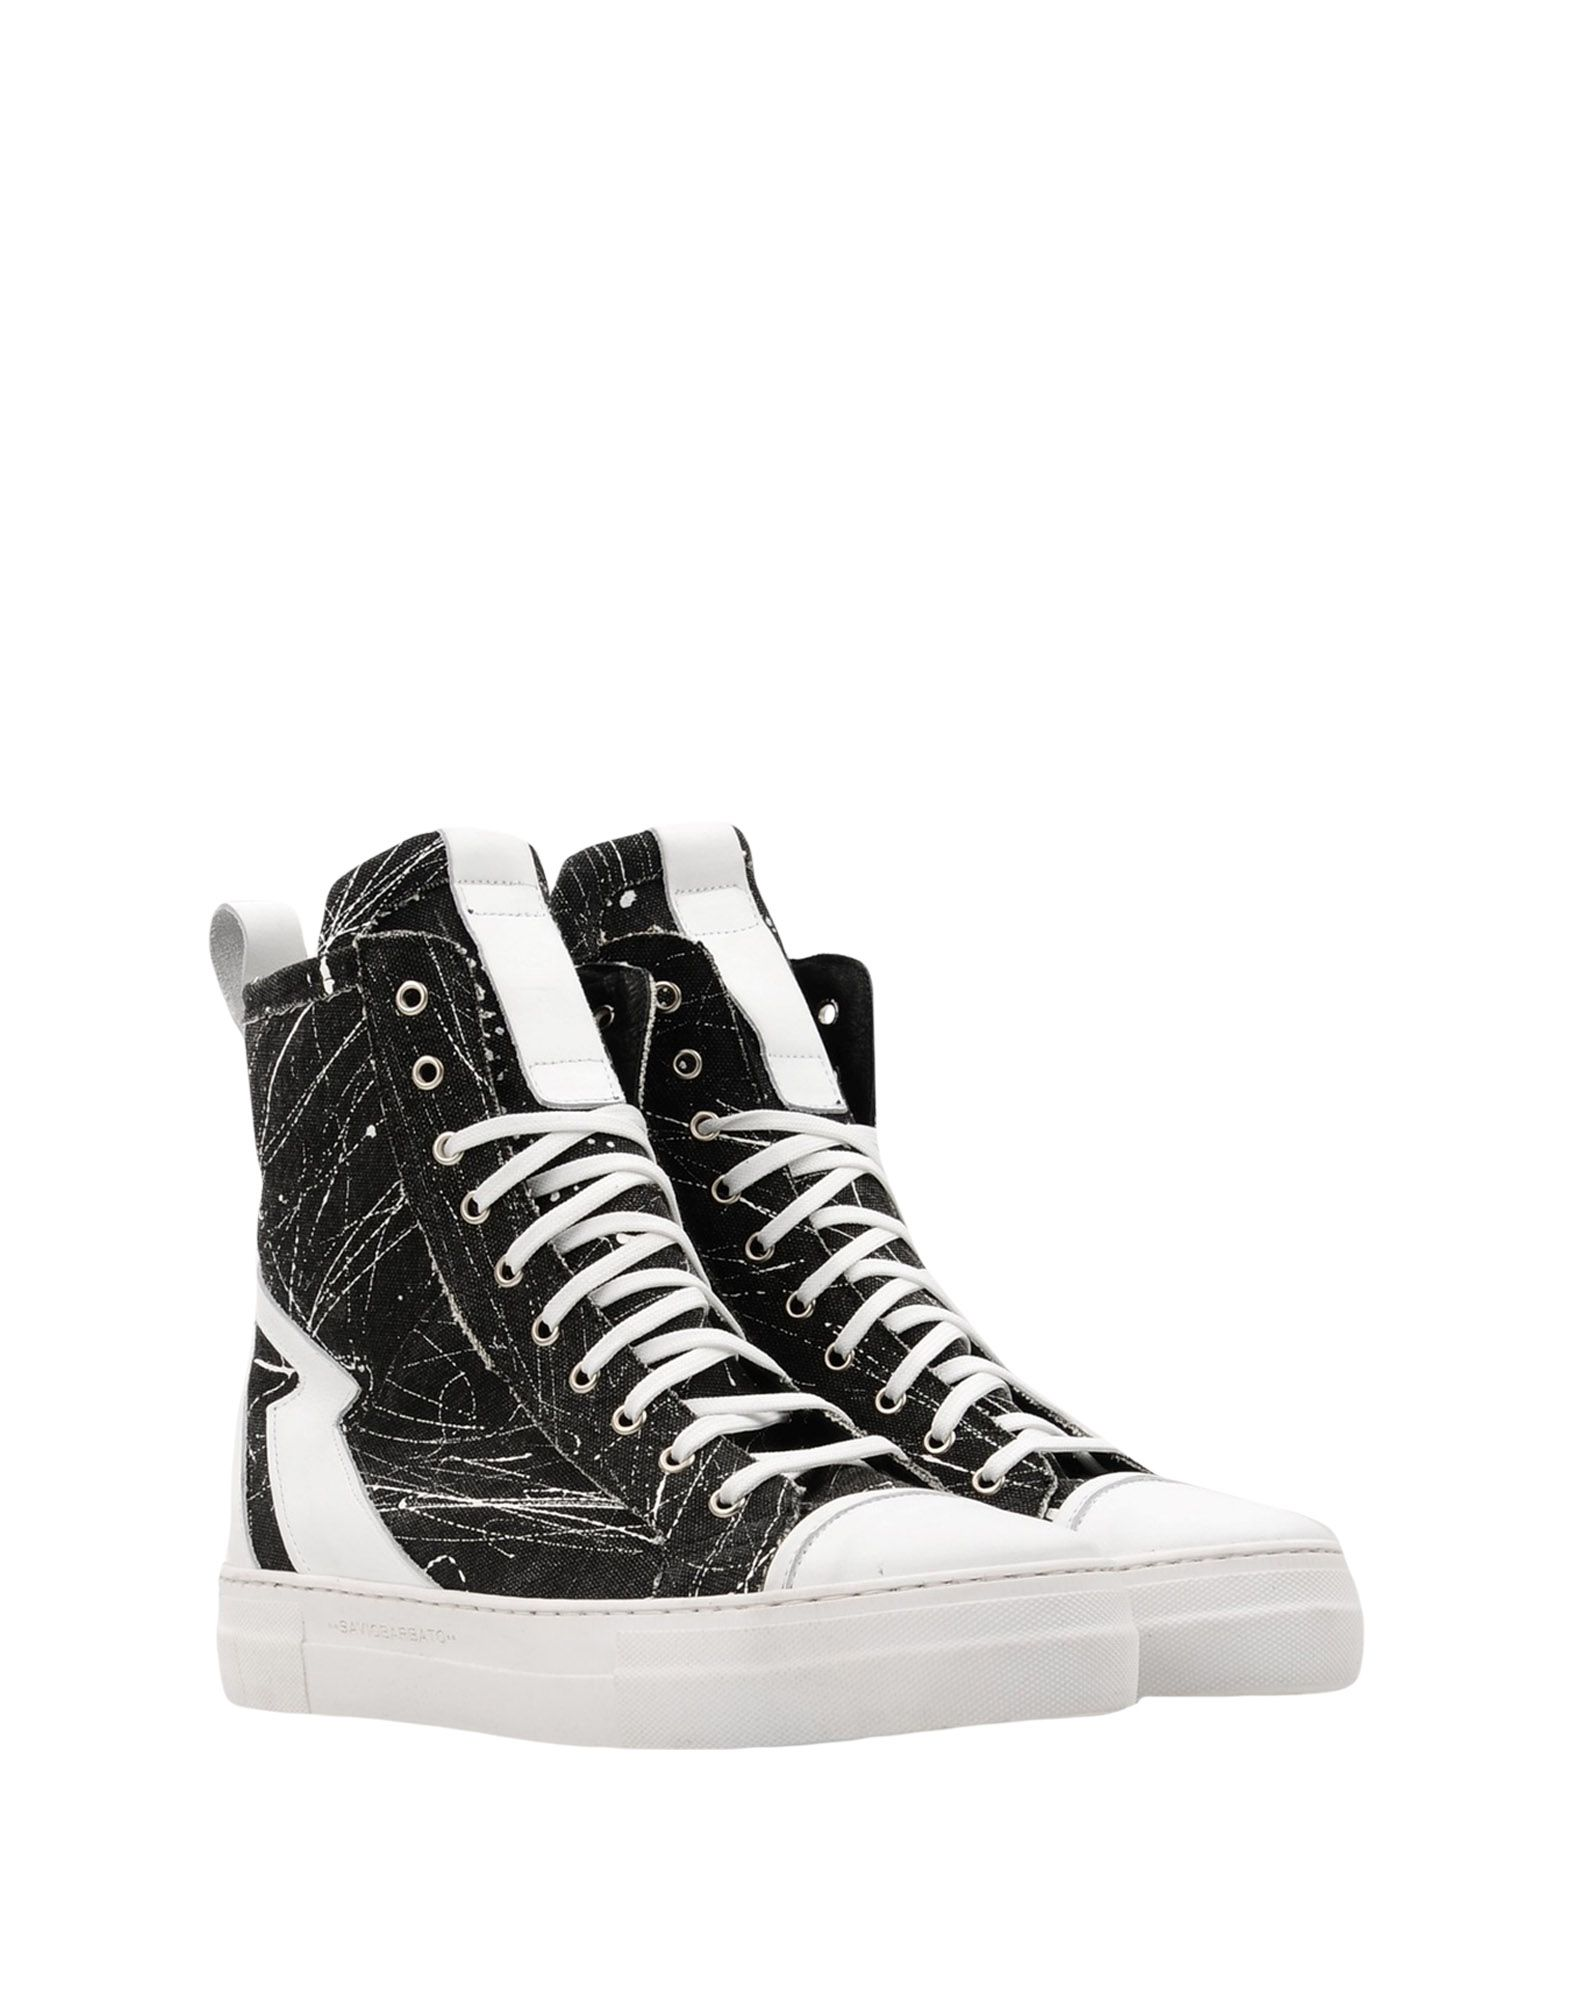 Savio Barbato Sneakers Sneakers Barbato Herren  11447842LG ed01cb